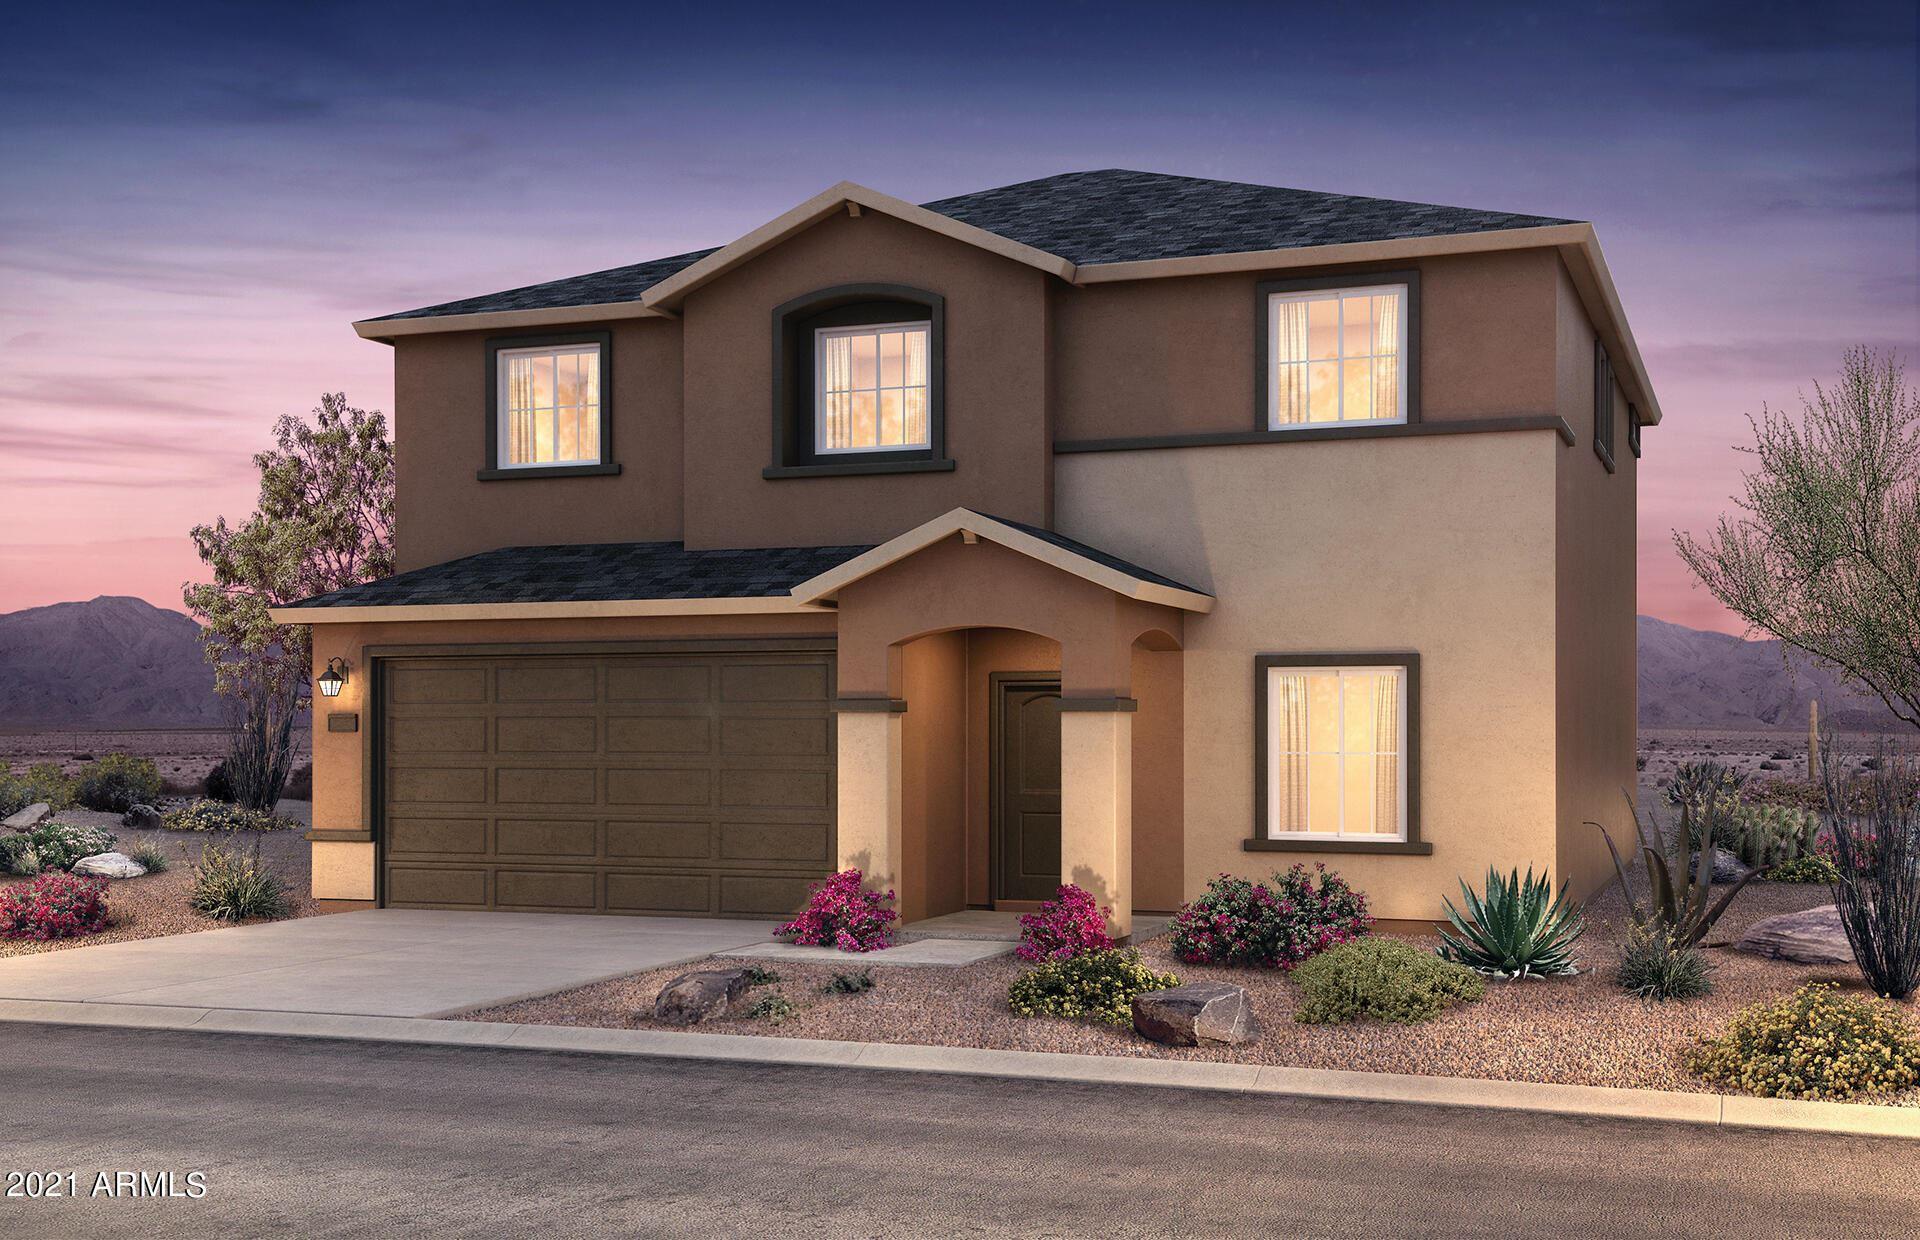 Photo for 43620 W MESCAL Drive, Maricopa, AZ 85138 (MLS # 6290554)